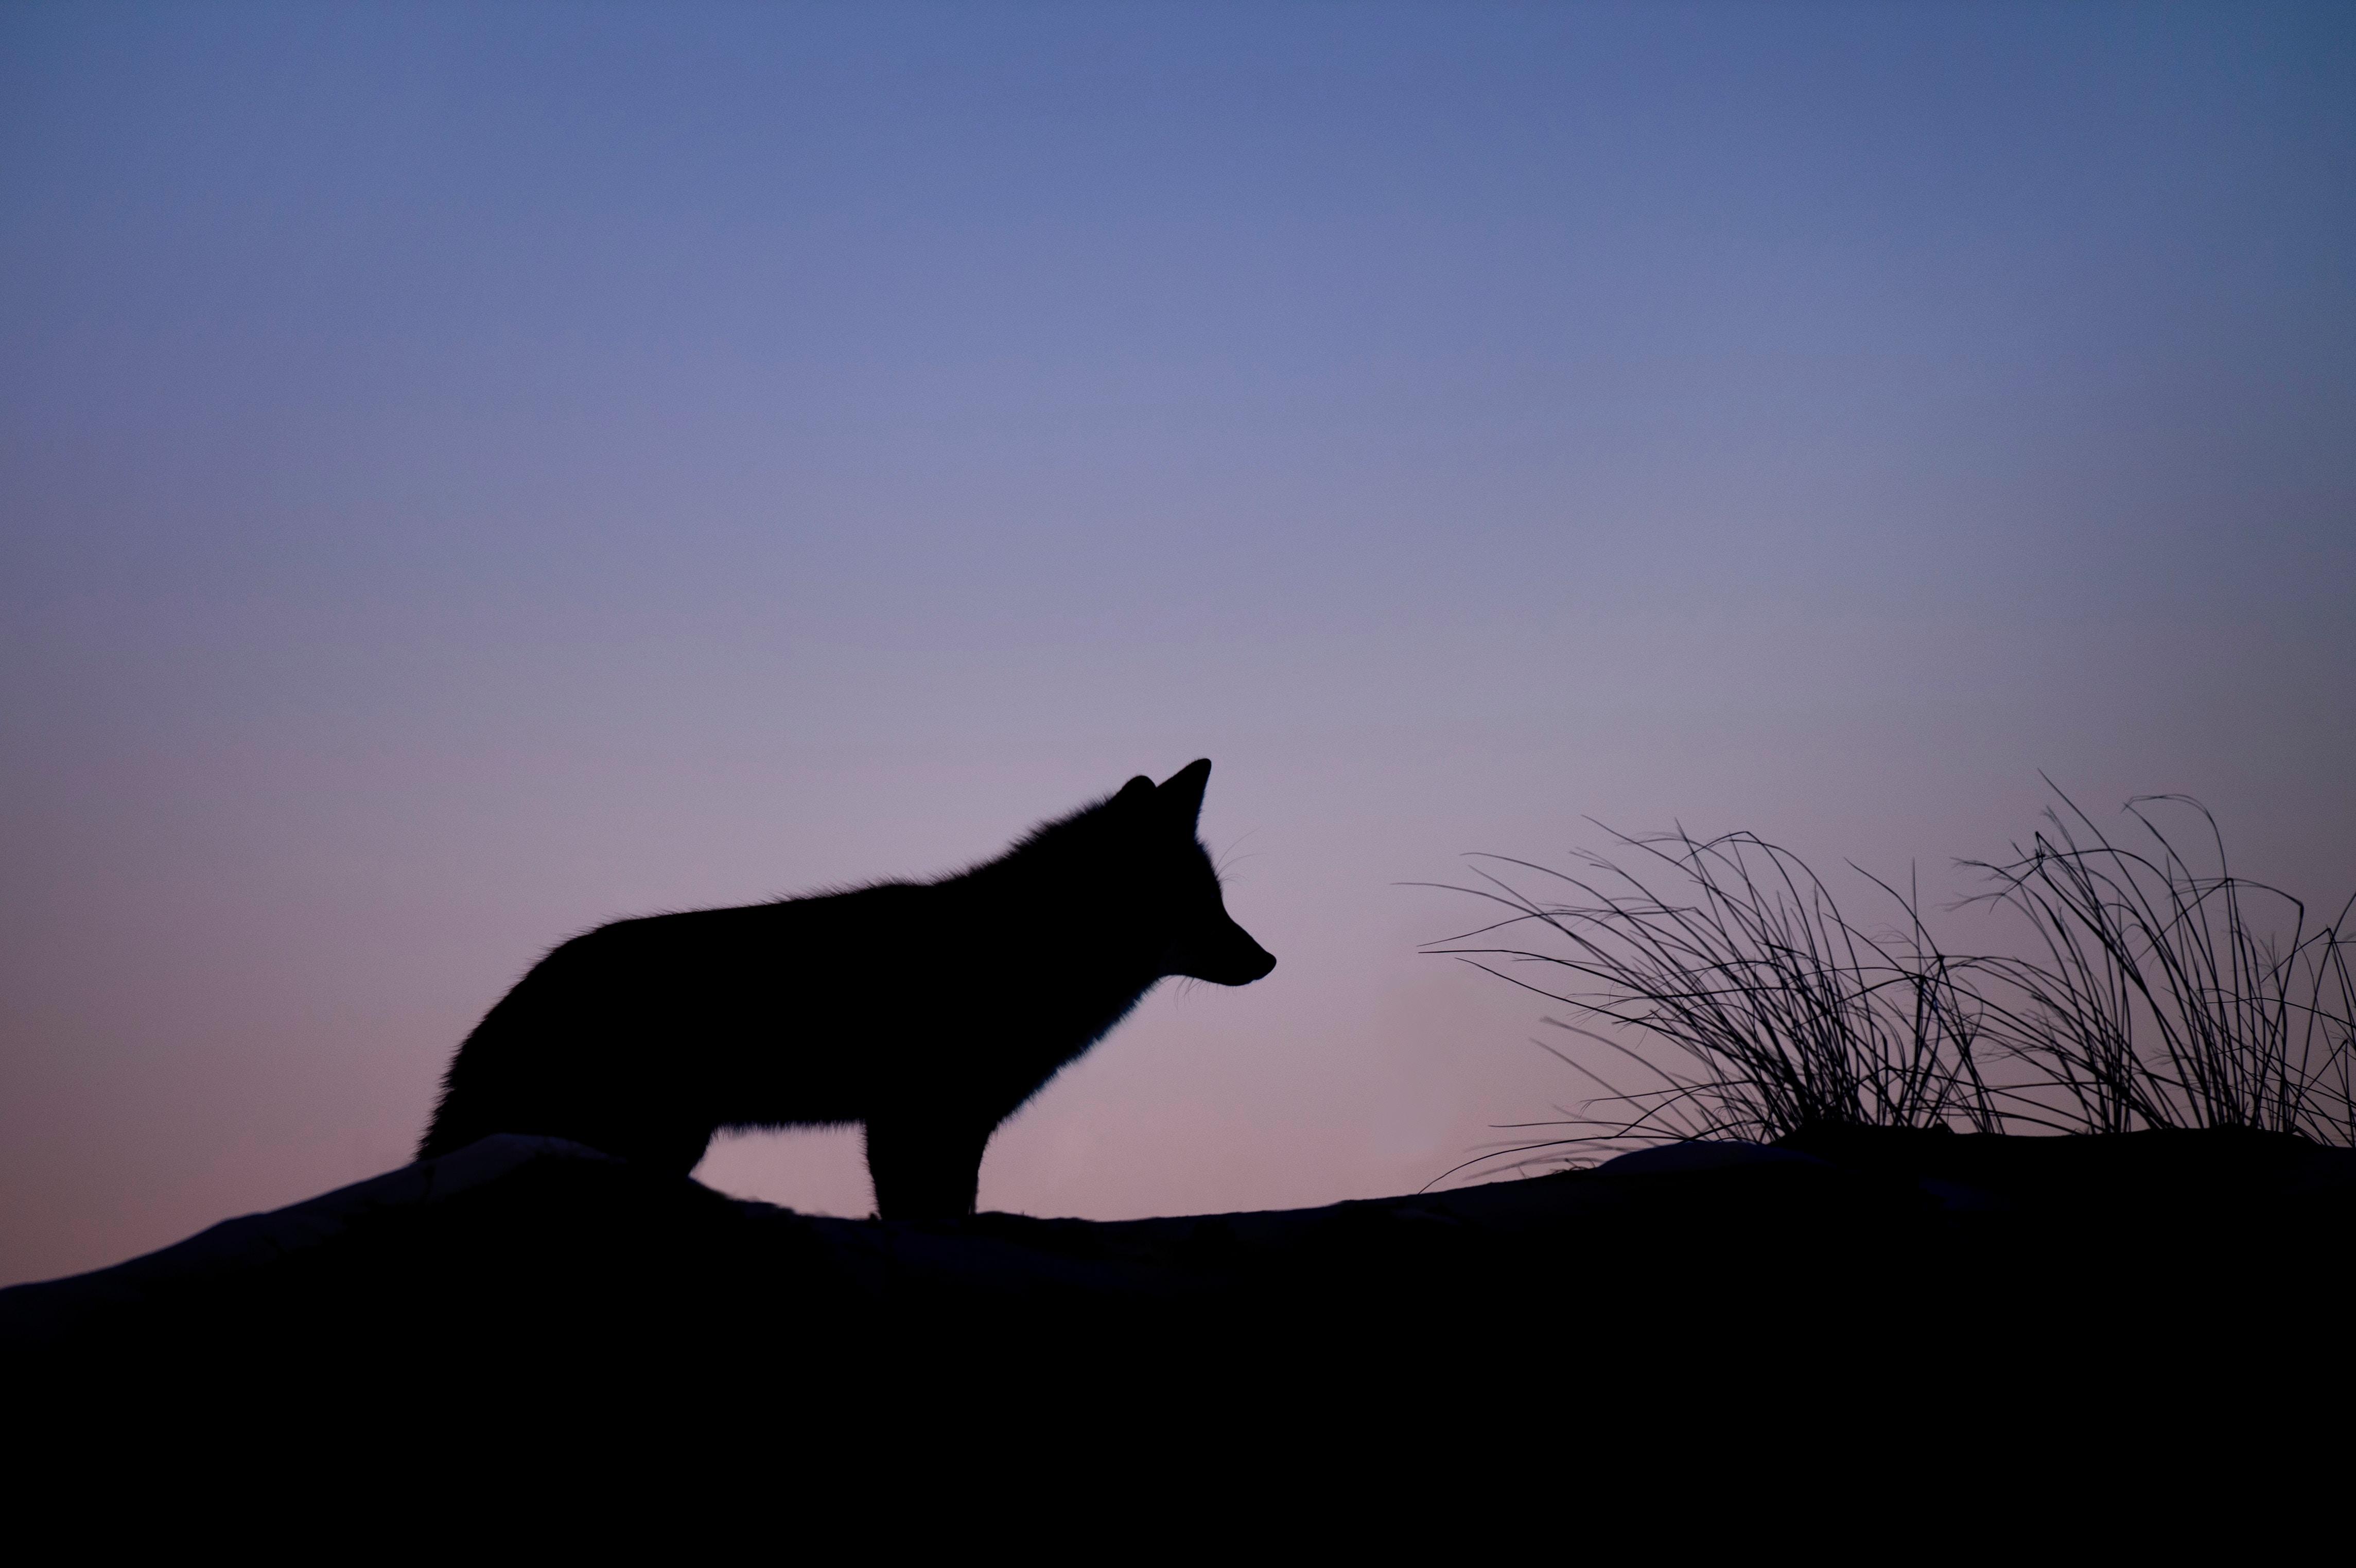 vaswolf